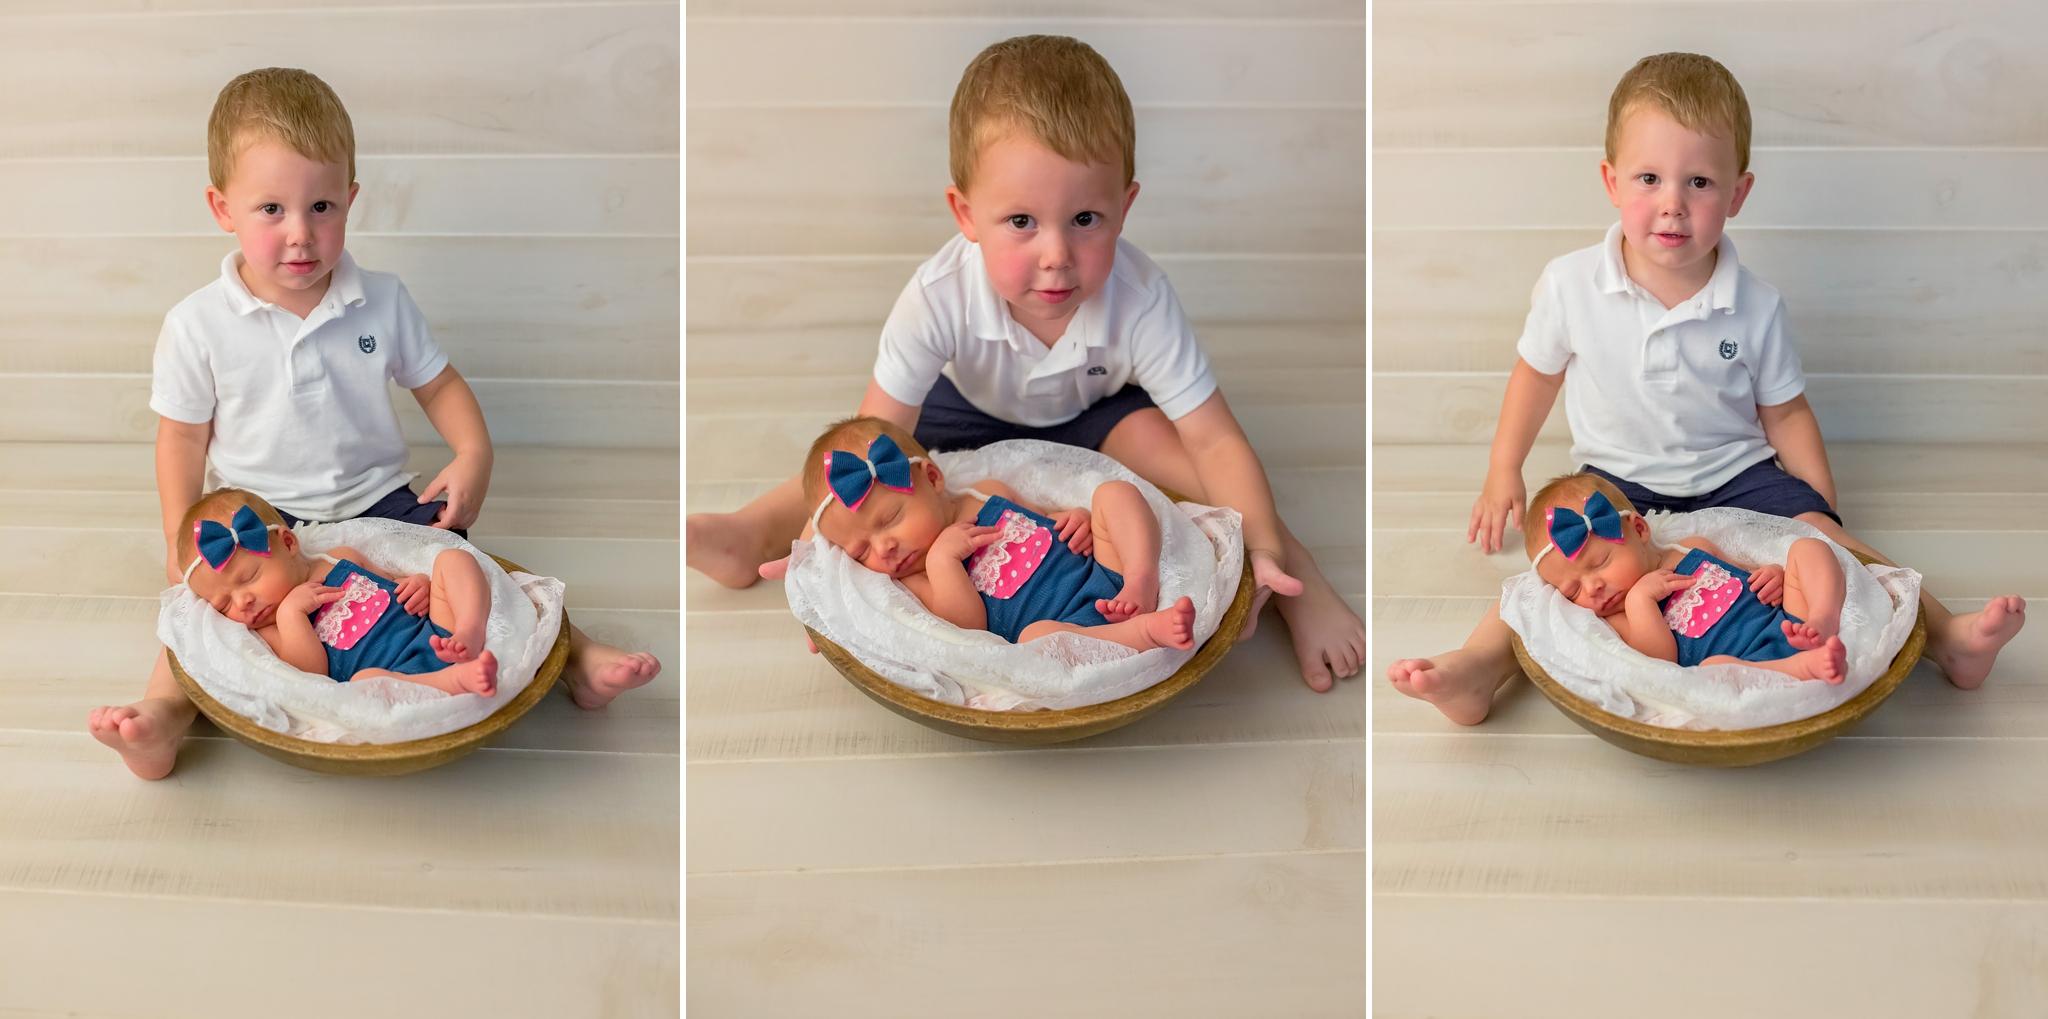 candacewolfenbarger newborn baby photographer sanford pinehurst apex pittsboro nc novie marie nb 8.jpg